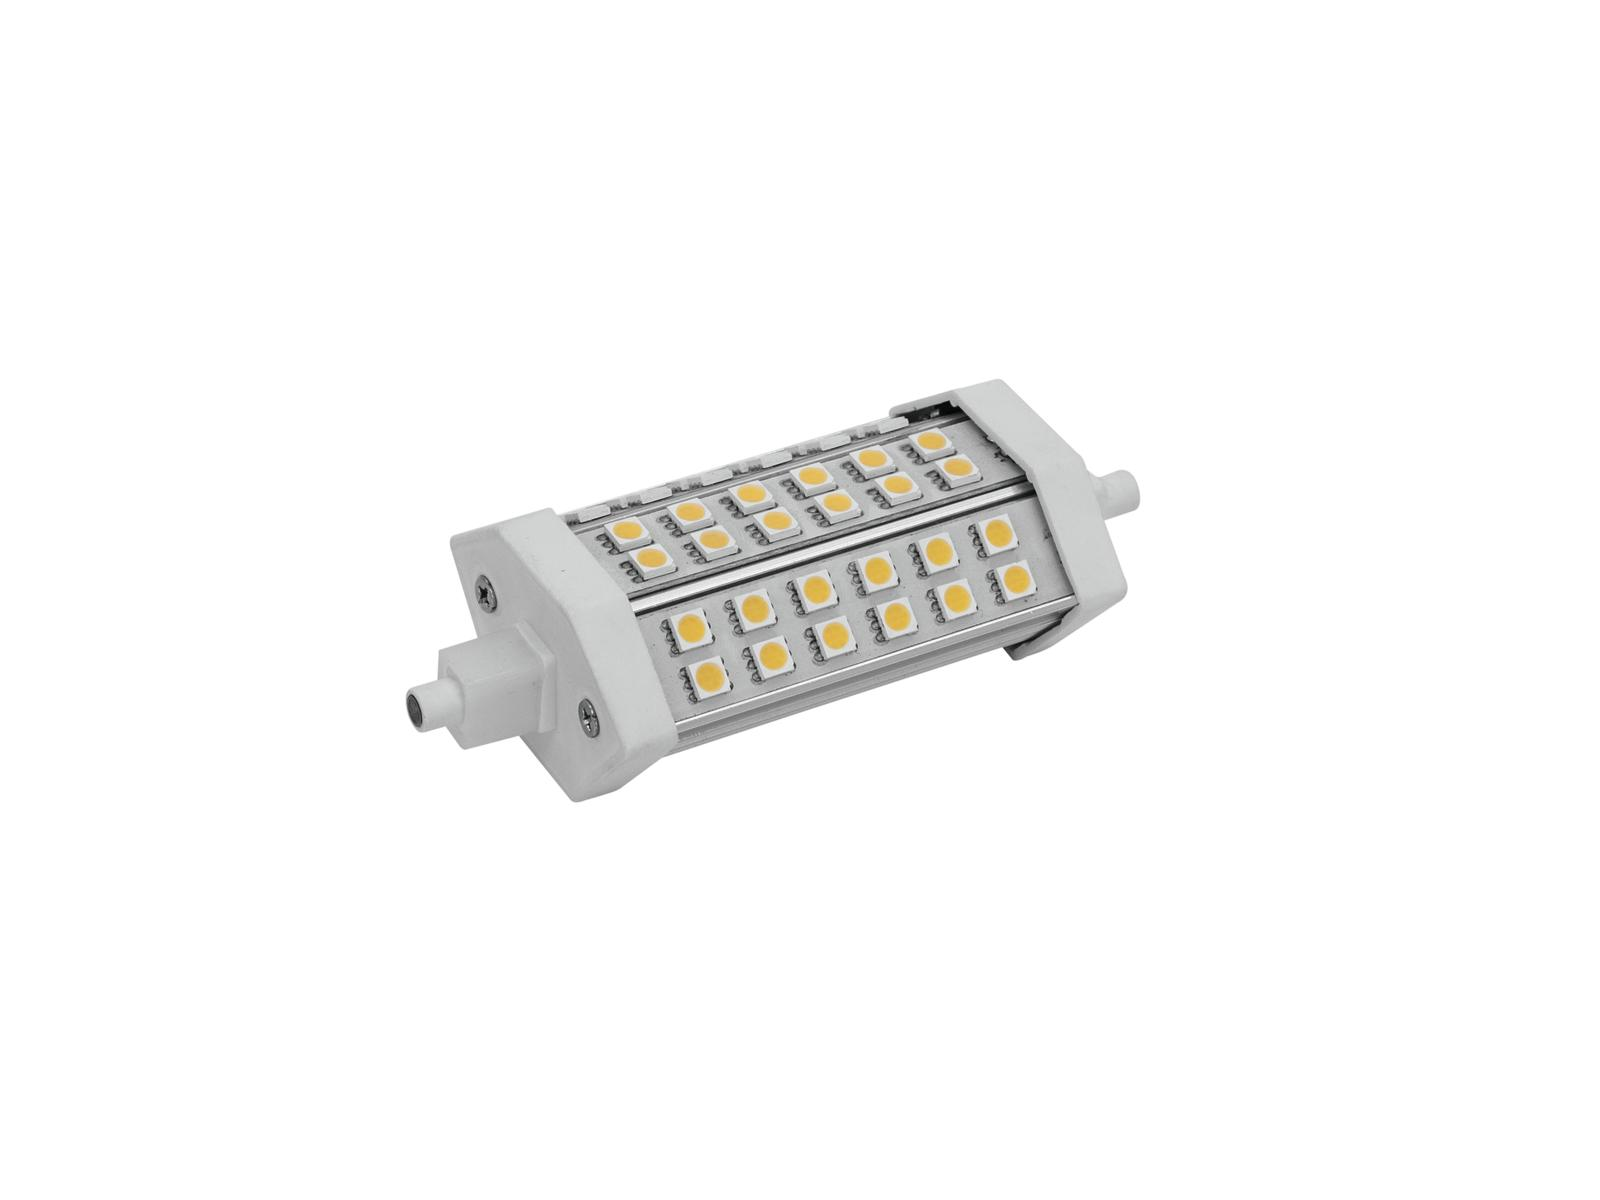 OMNILUX LED R7S 230V 8W 6400K luce del cereale di SMD5050 dimmerabile